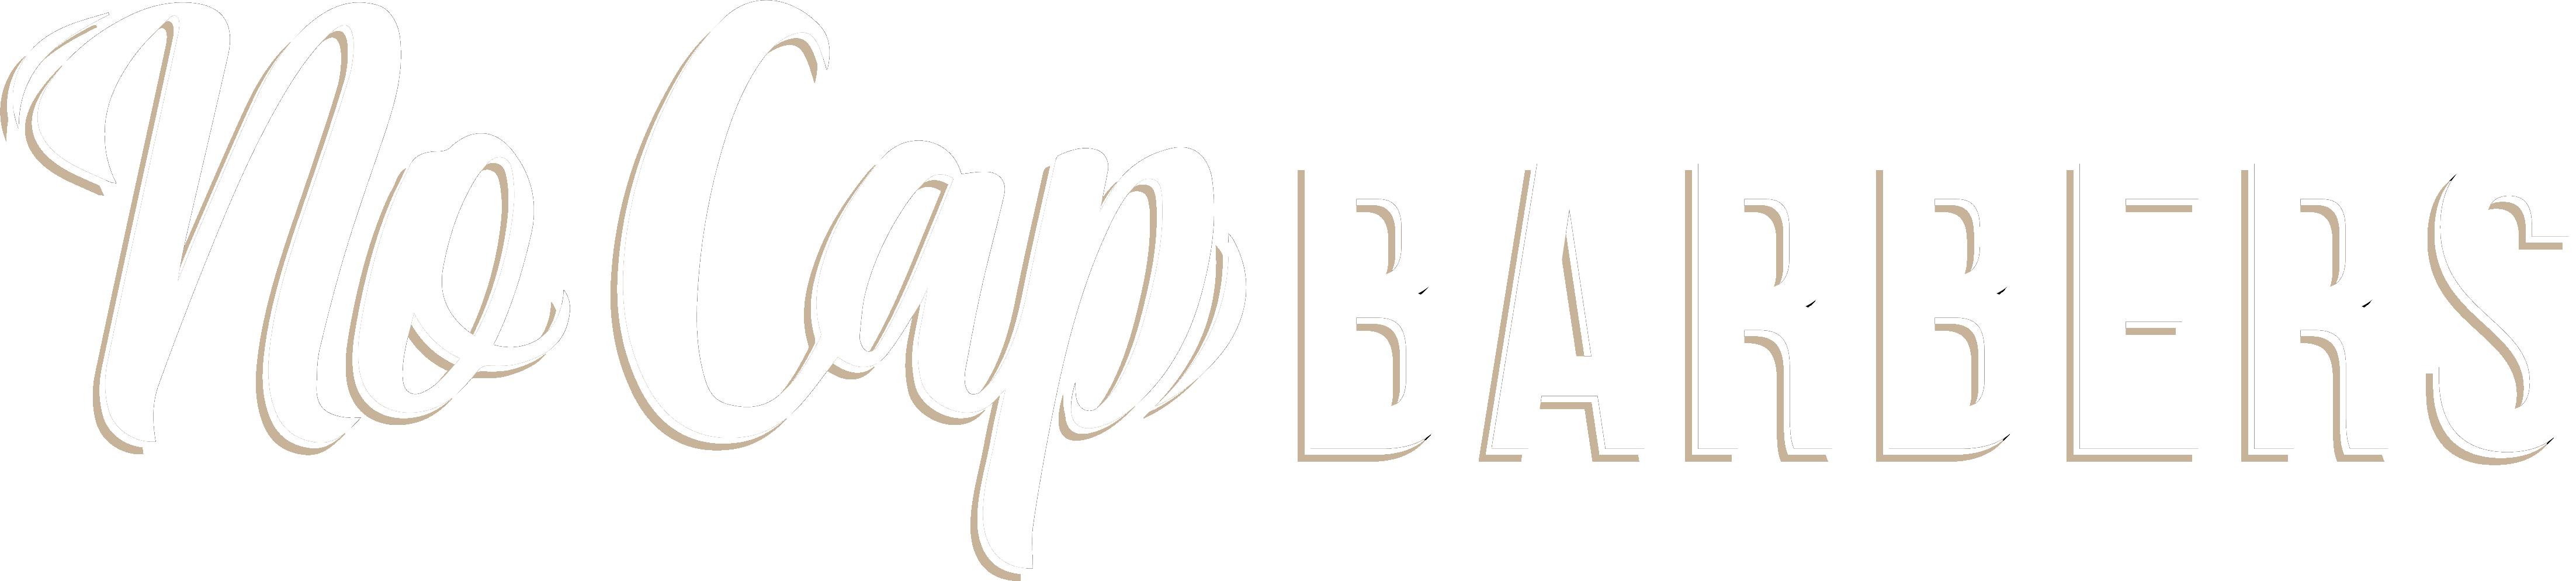 NoCap Barbers | Barber Shop 1010 Wien